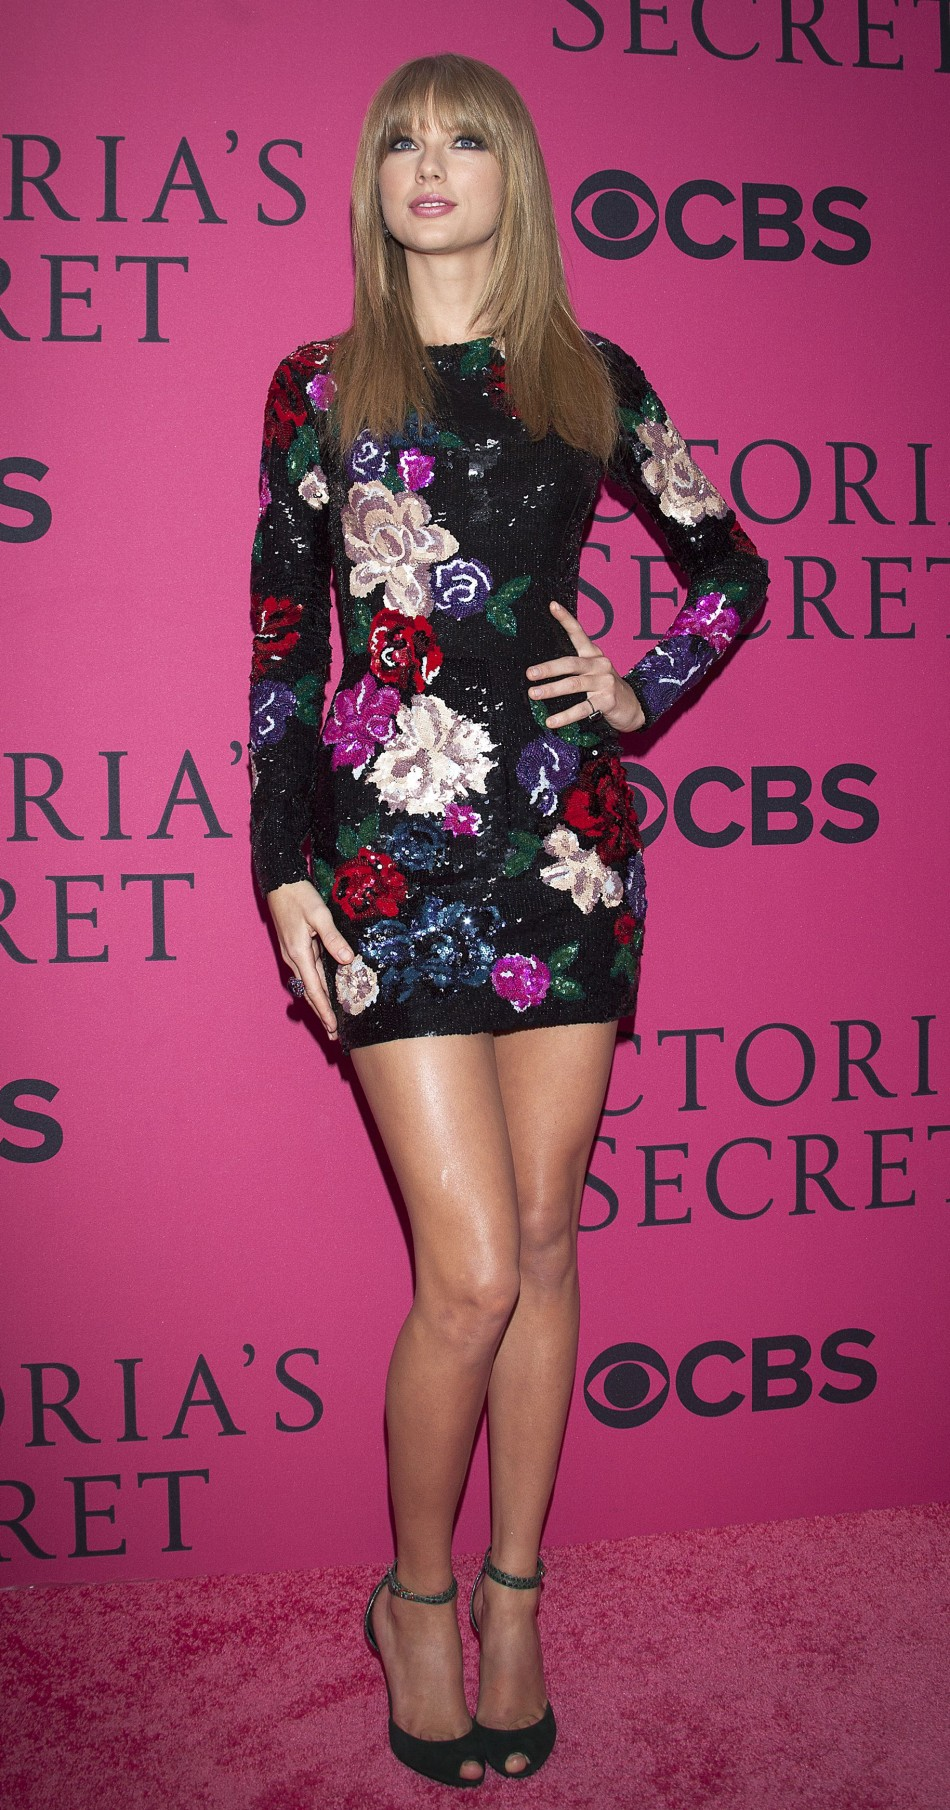 Taylor Swift shows off her catwalk worthy legs in mini dress.